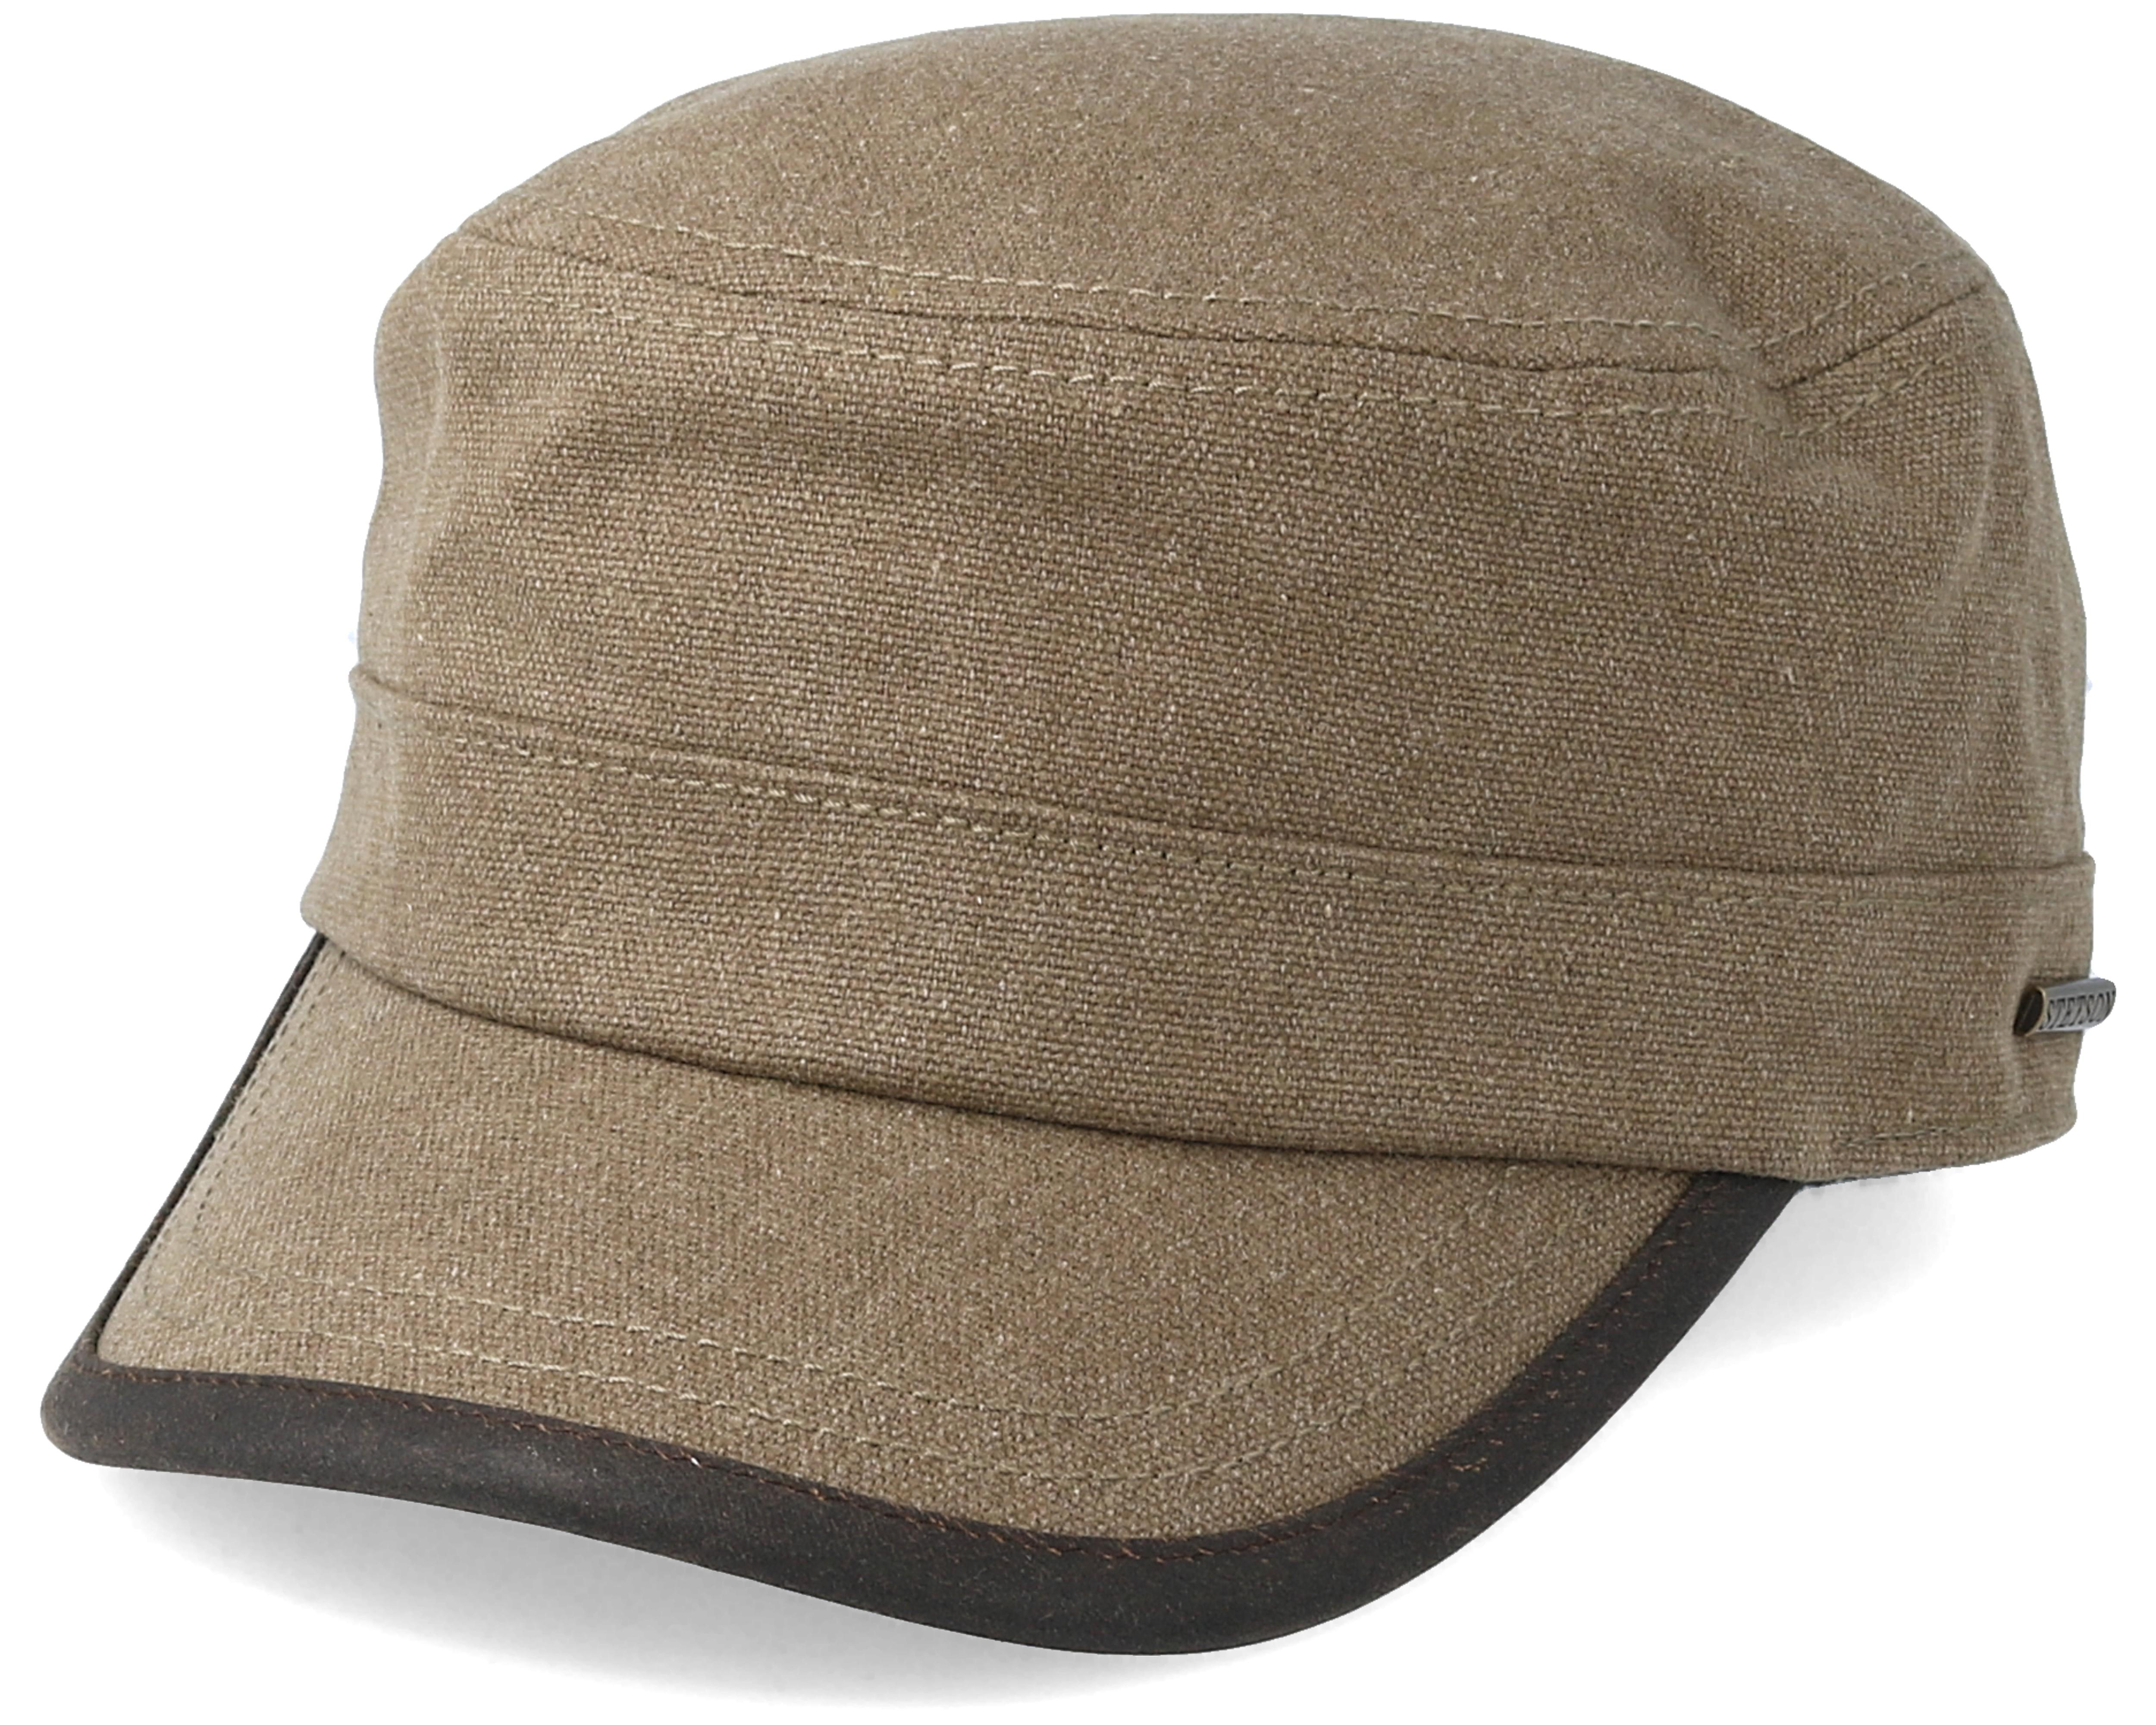 9567a58f117b13 Hatteras Herringbone Flat Cap By Stetson